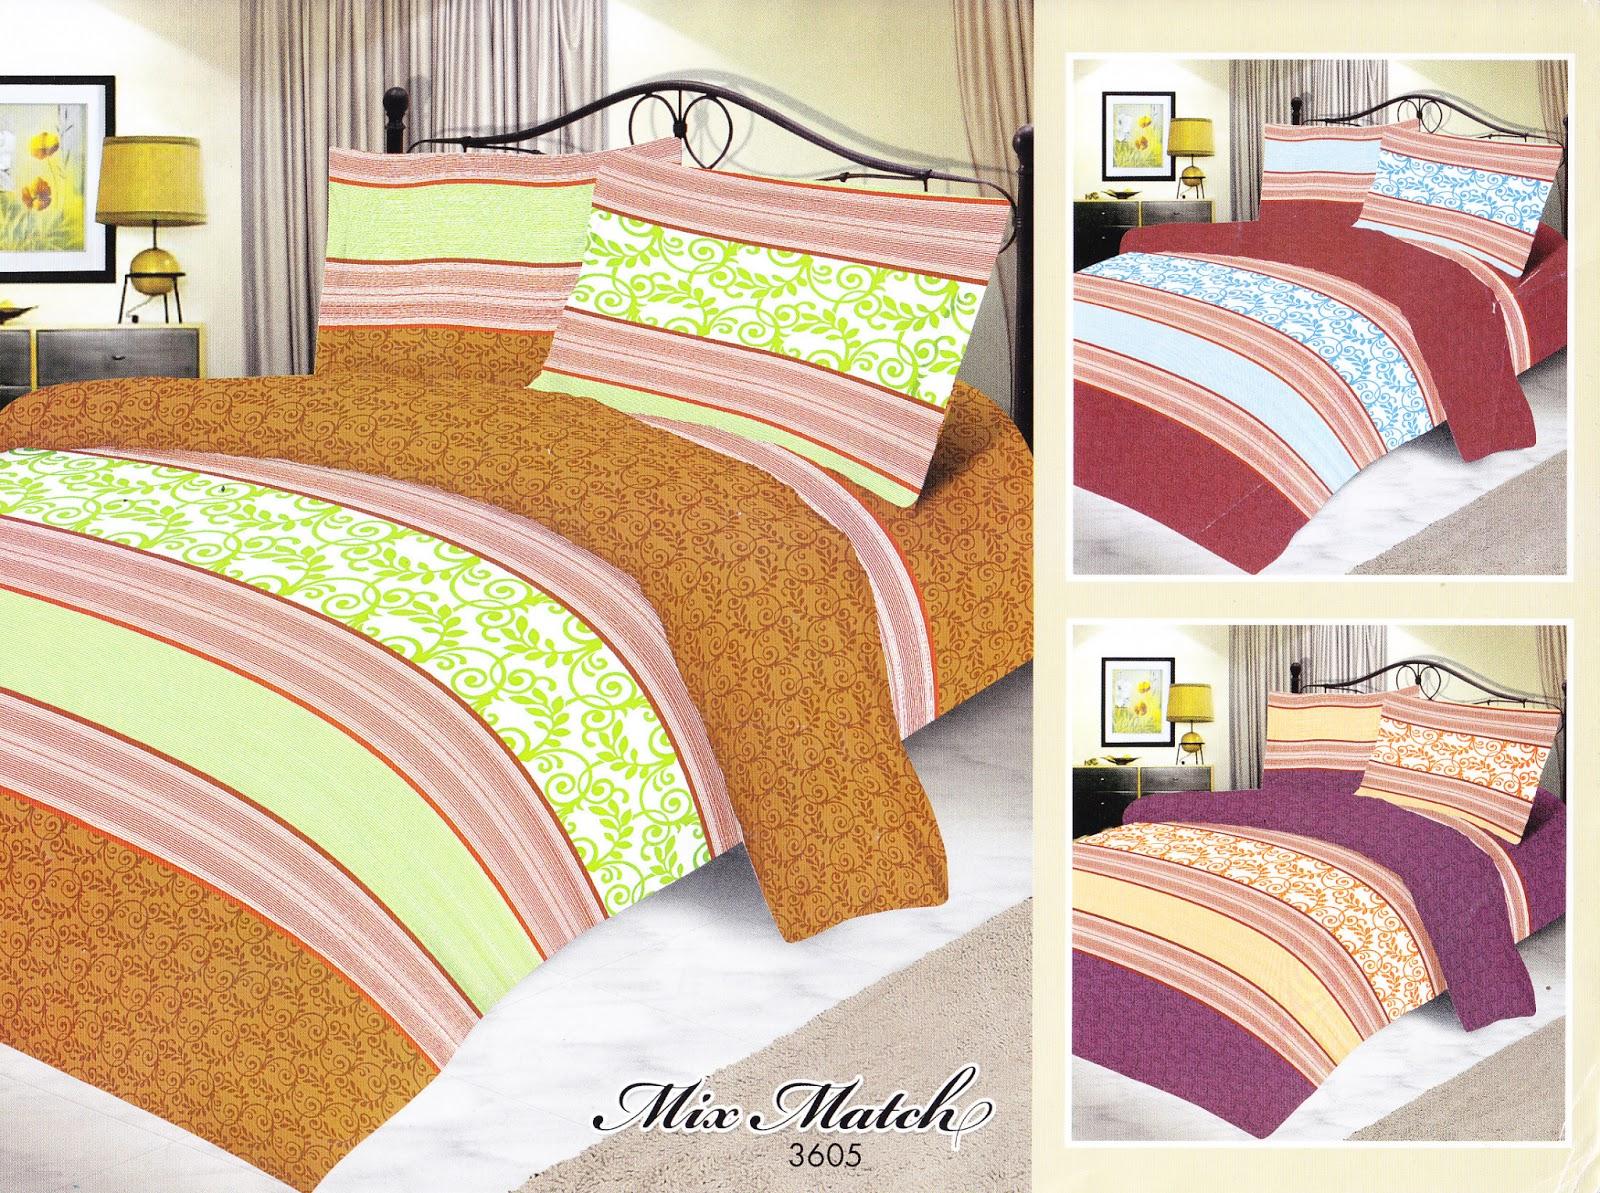 Bed cover my love anak - Sprei My Love Motif Anak